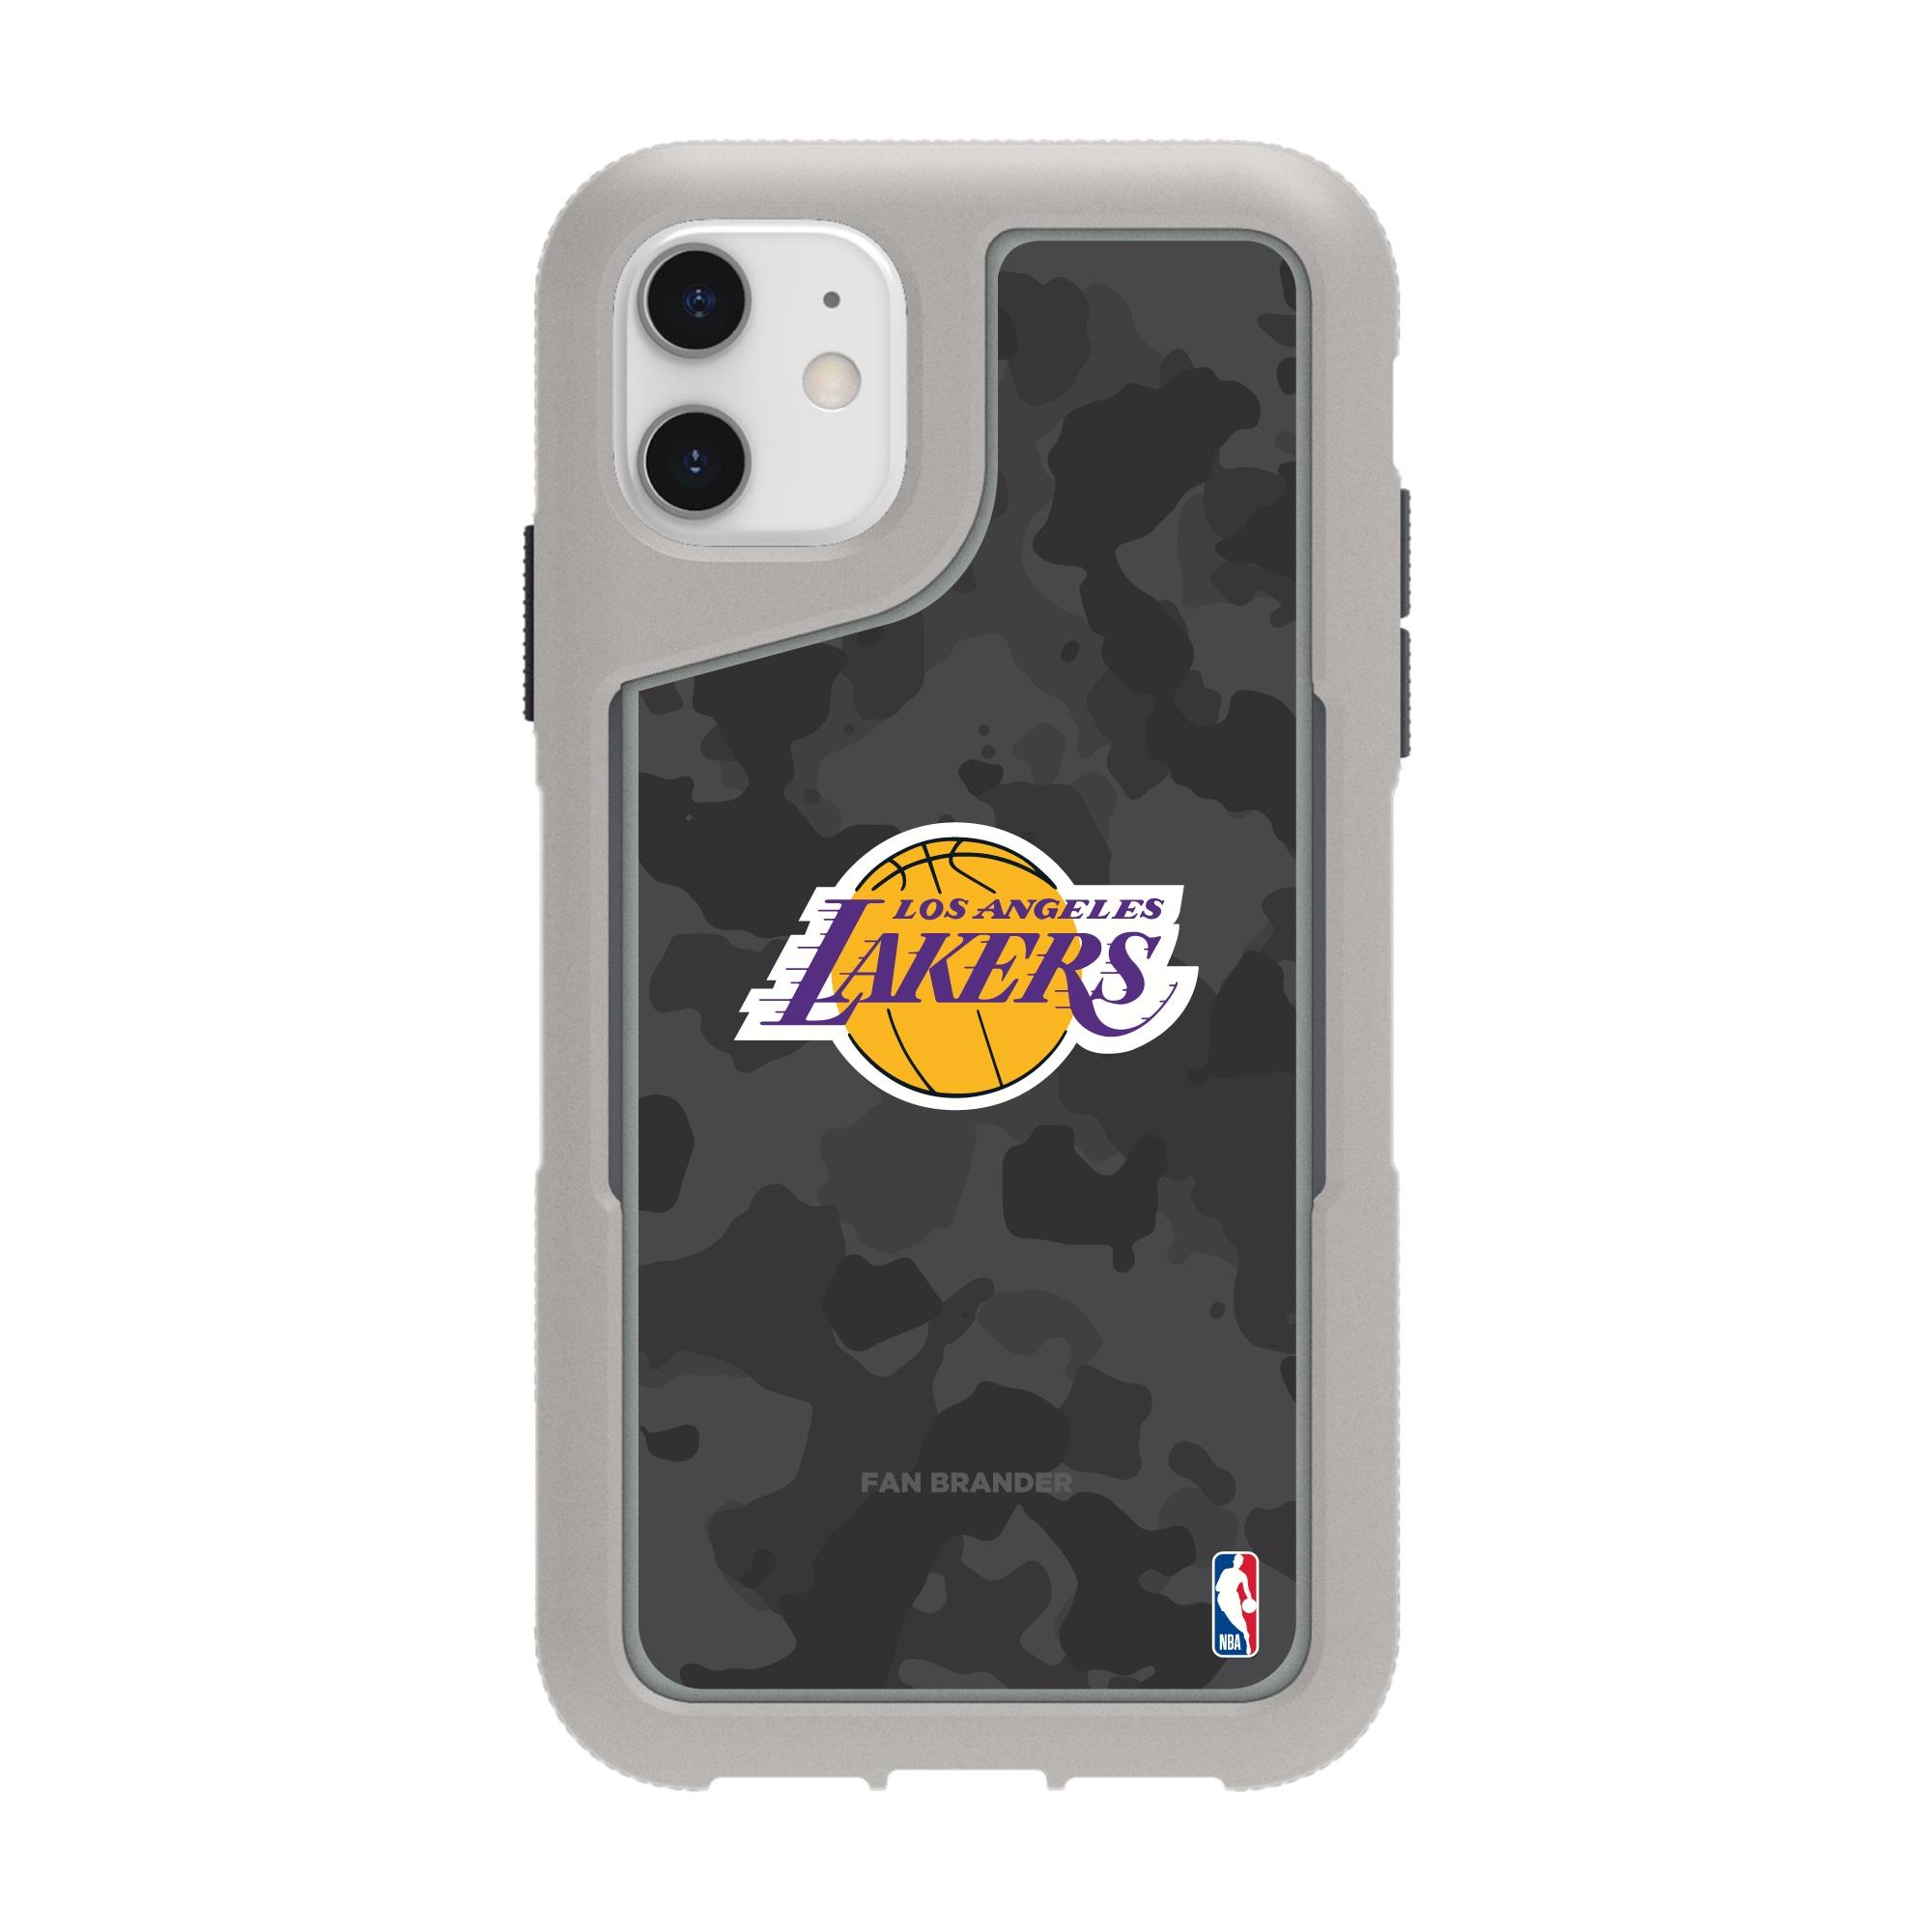 Los Angeles Lakers Griffin Survivor Endurance Camo iPhone Case - Gray